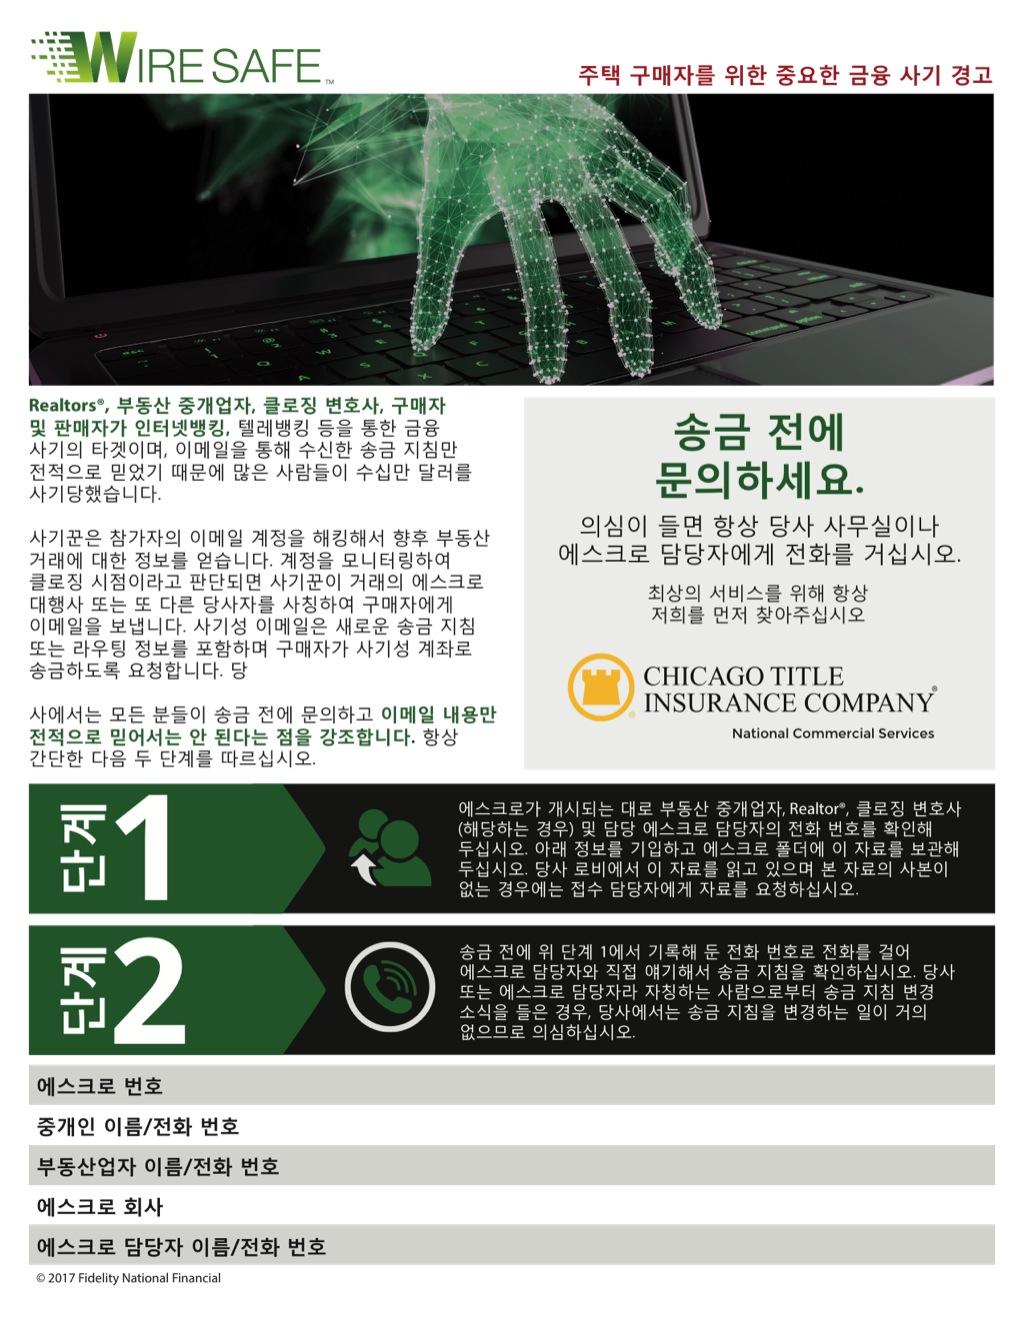 Corefact Wire Safe Buyer Flyer - Korean - CTIC NCS